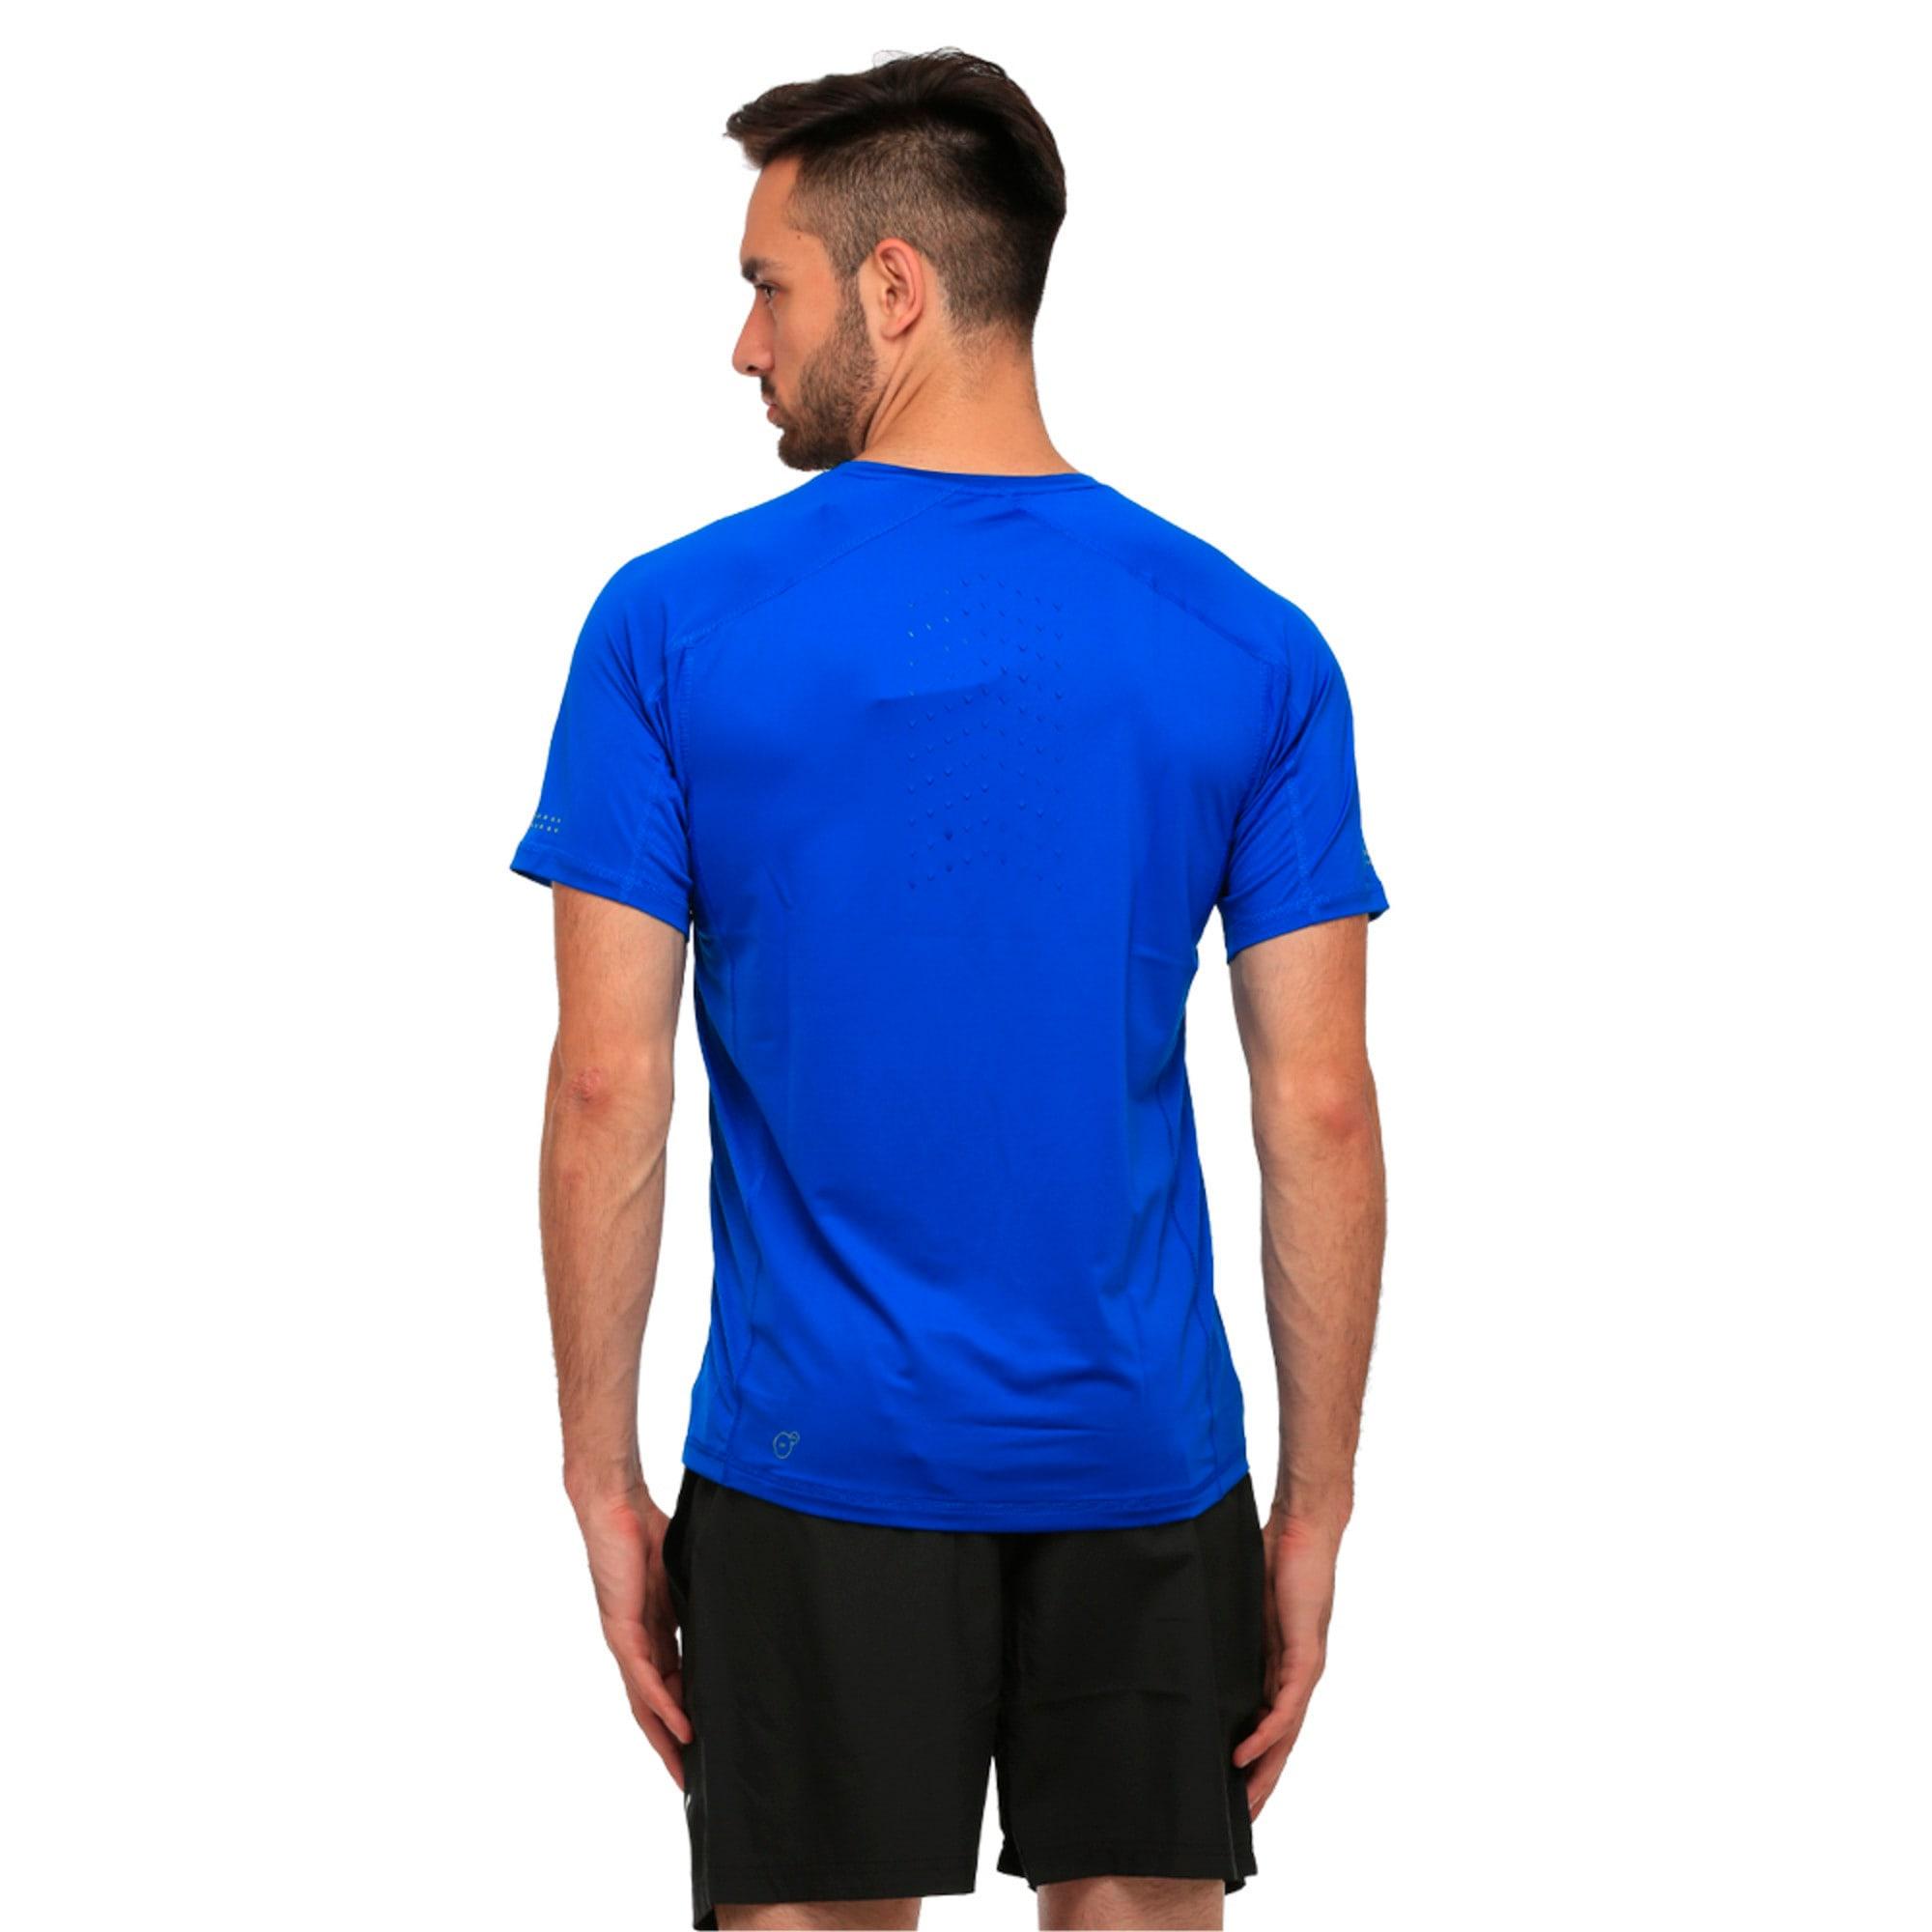 Thumbnail 4 of Running Men's Speed T-Shirt, Lapis Blue, medium-IND